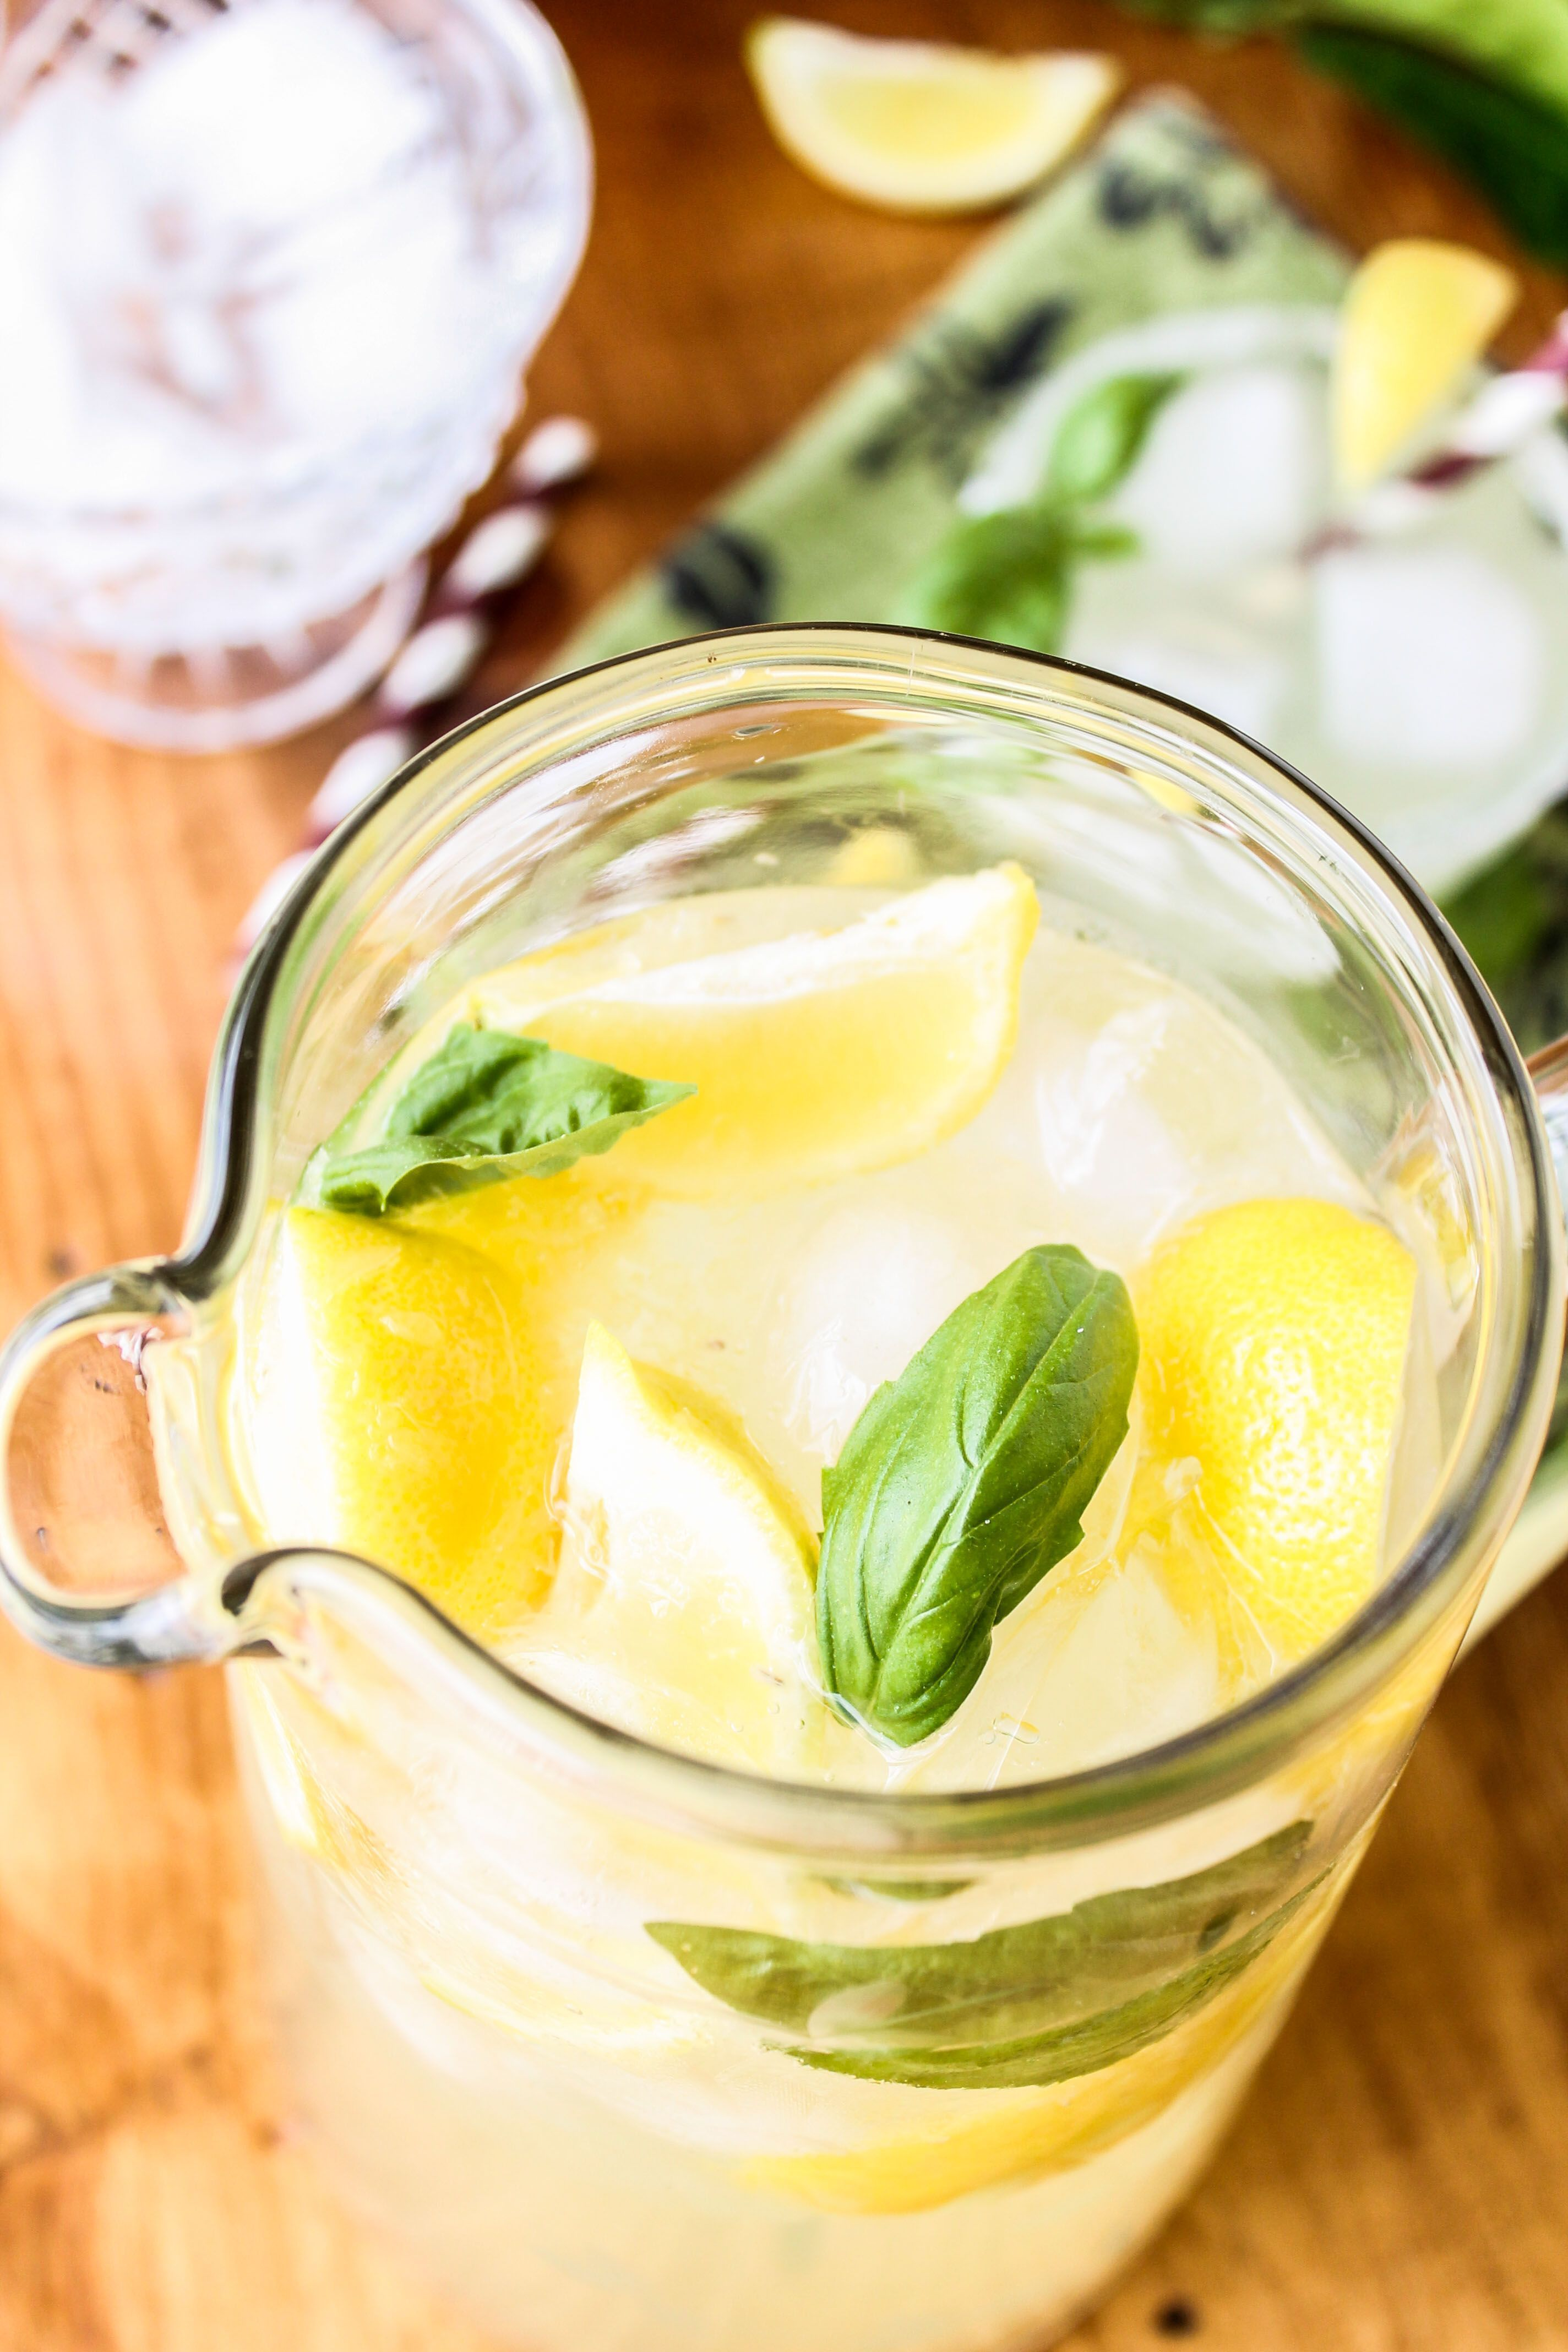 Basil Lemonade -- add basil seed to it. #basillemonade Basil Lemonade -- add basil seed to it. #basillemonade Basil Lemonade -- add basil seed to it. #basillemonade Basil Lemonade -- add basil seed to it. #basillemonade Basil Lemonade -- add basil seed to it. #basillemonade Basil Lemonade -- add basil seed to it. #basillemonade Basil Lemonade -- add basil seed to it. #basillemonade Basil Lemonade -- add basil seed to it. #basillemonade